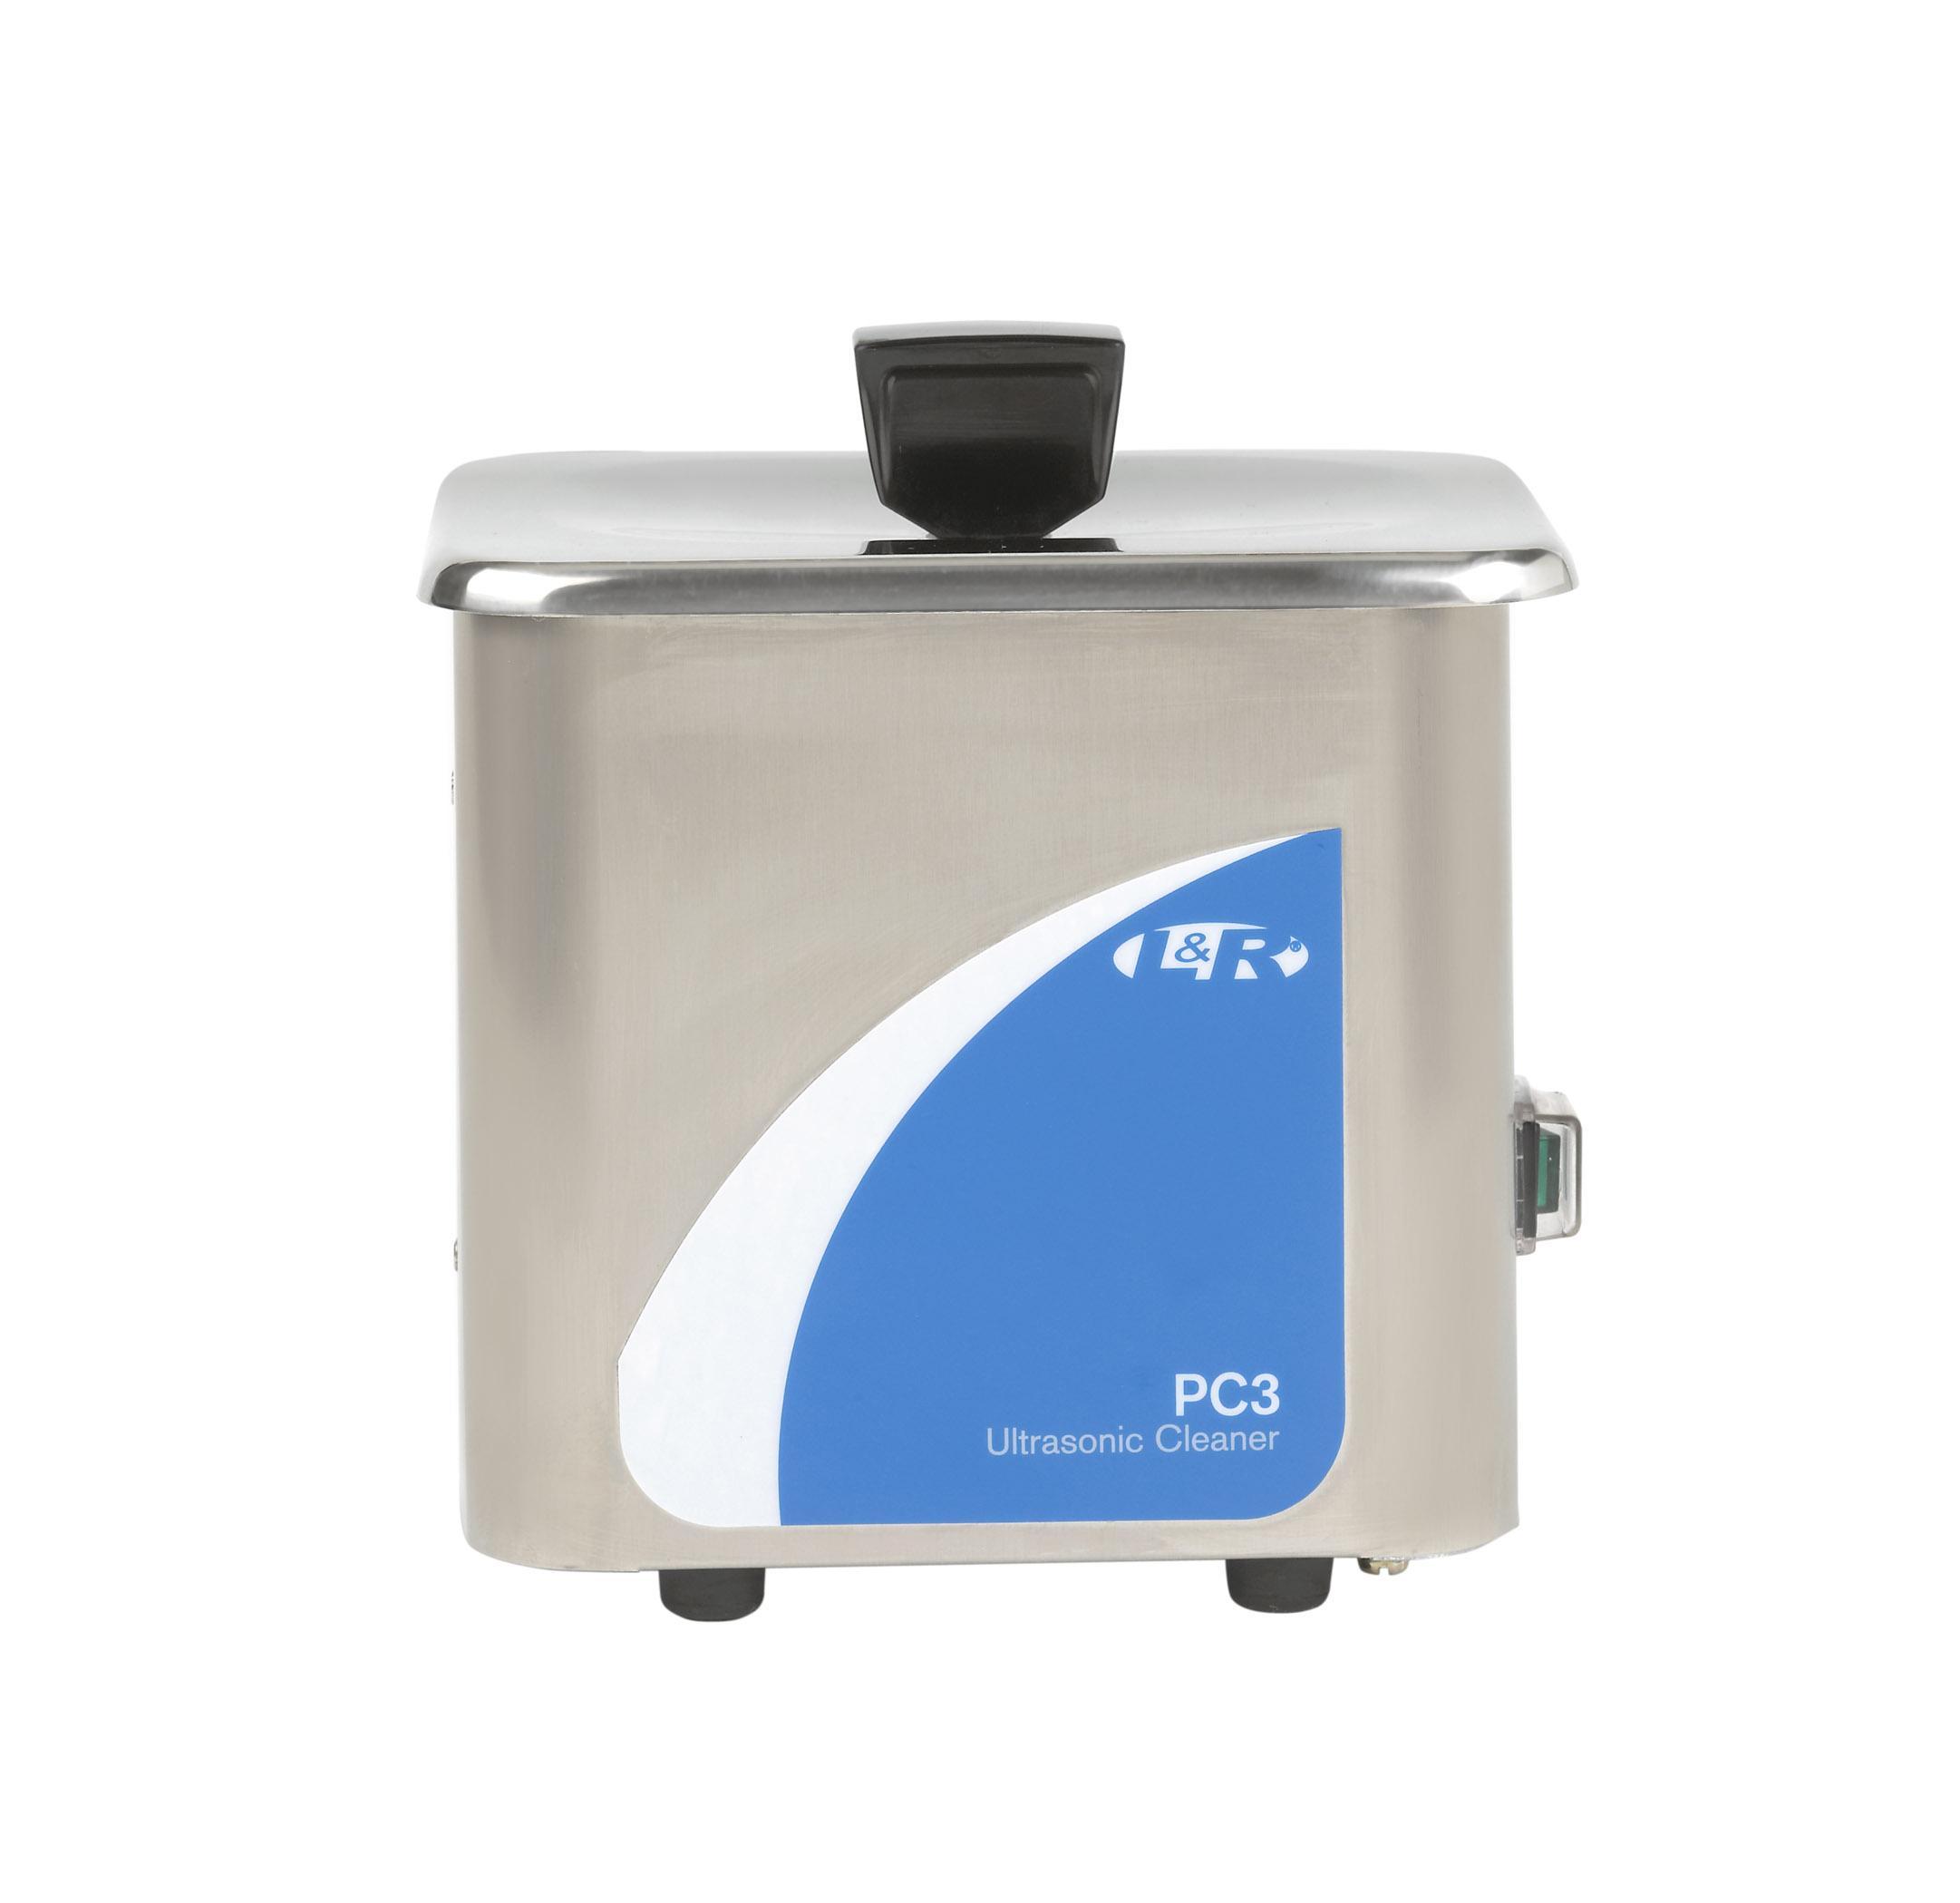 CLPC3  L&R Compact Ultrasonic Cleaning Machine